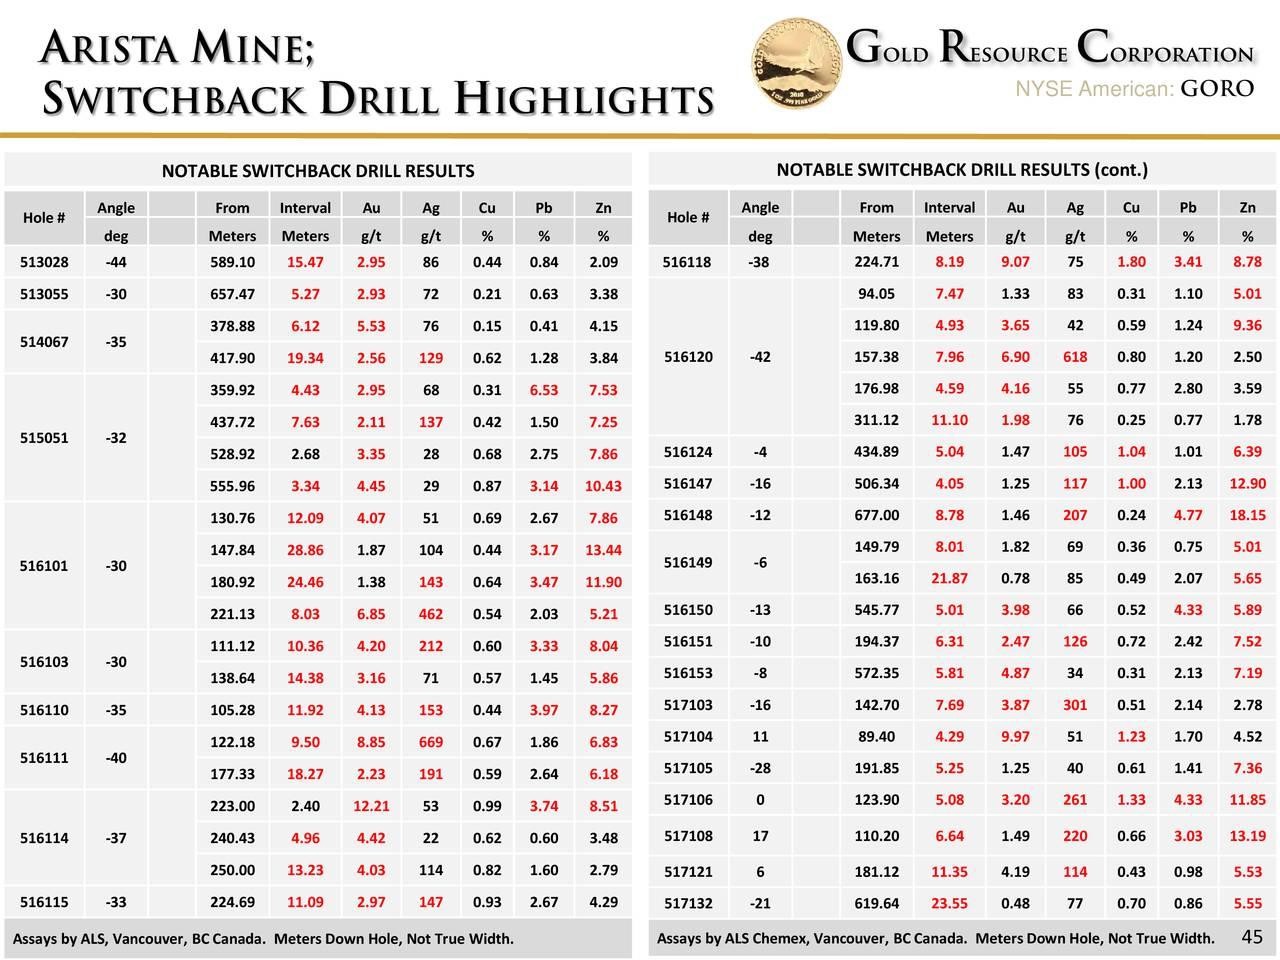 Gold Resource (GORO) Investor Presentation